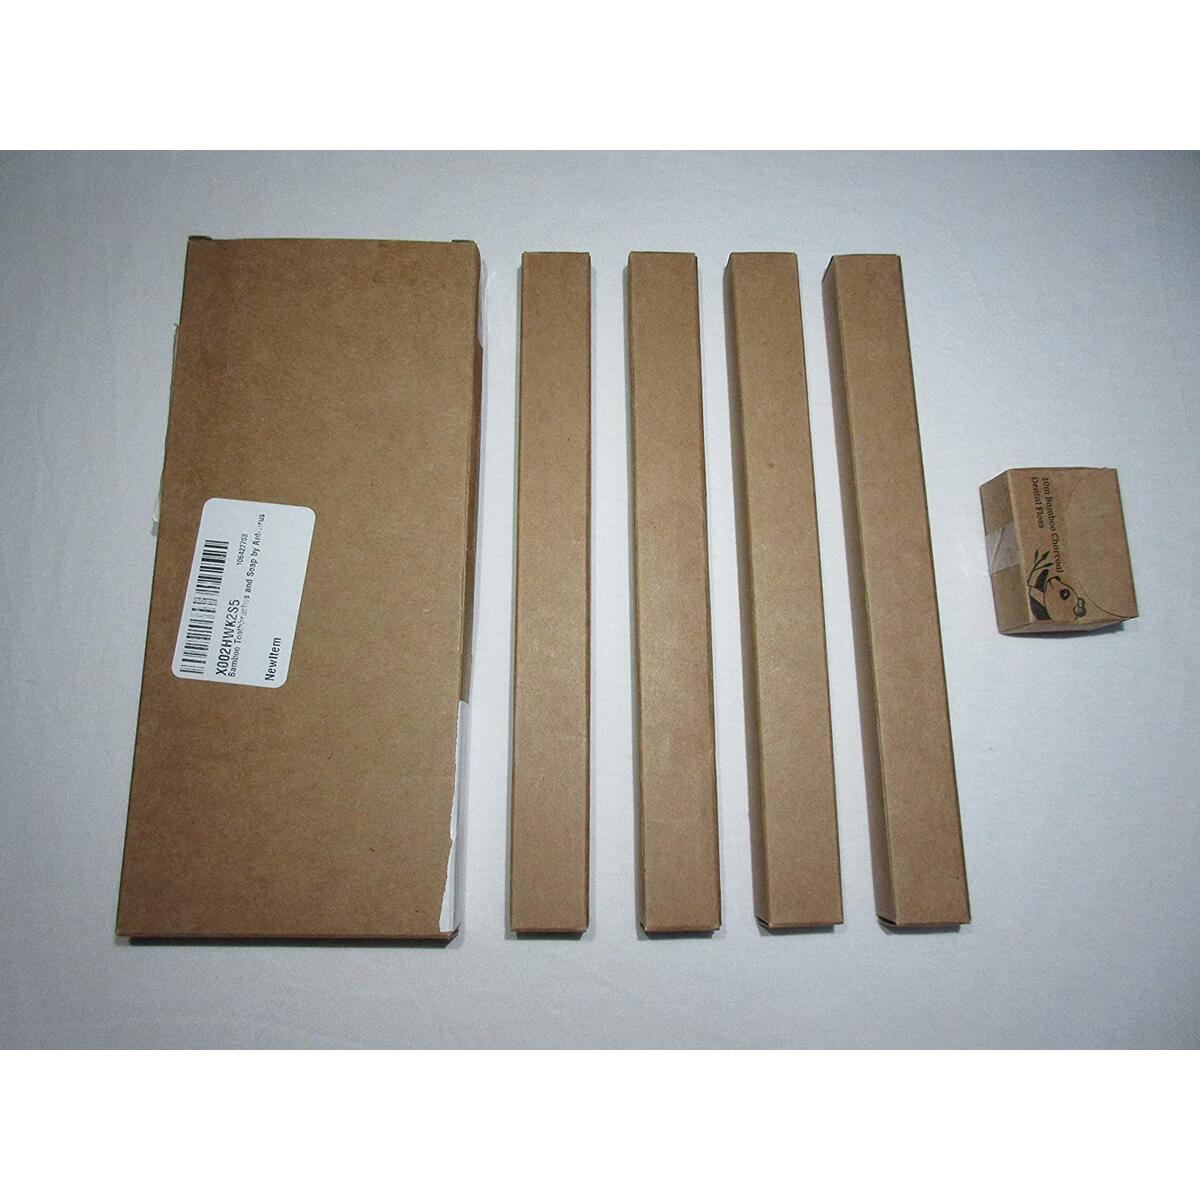 ANTIVIRUS Pack of 4 Bamboo Toothbrushes +10 Meters Dental Floss Gift